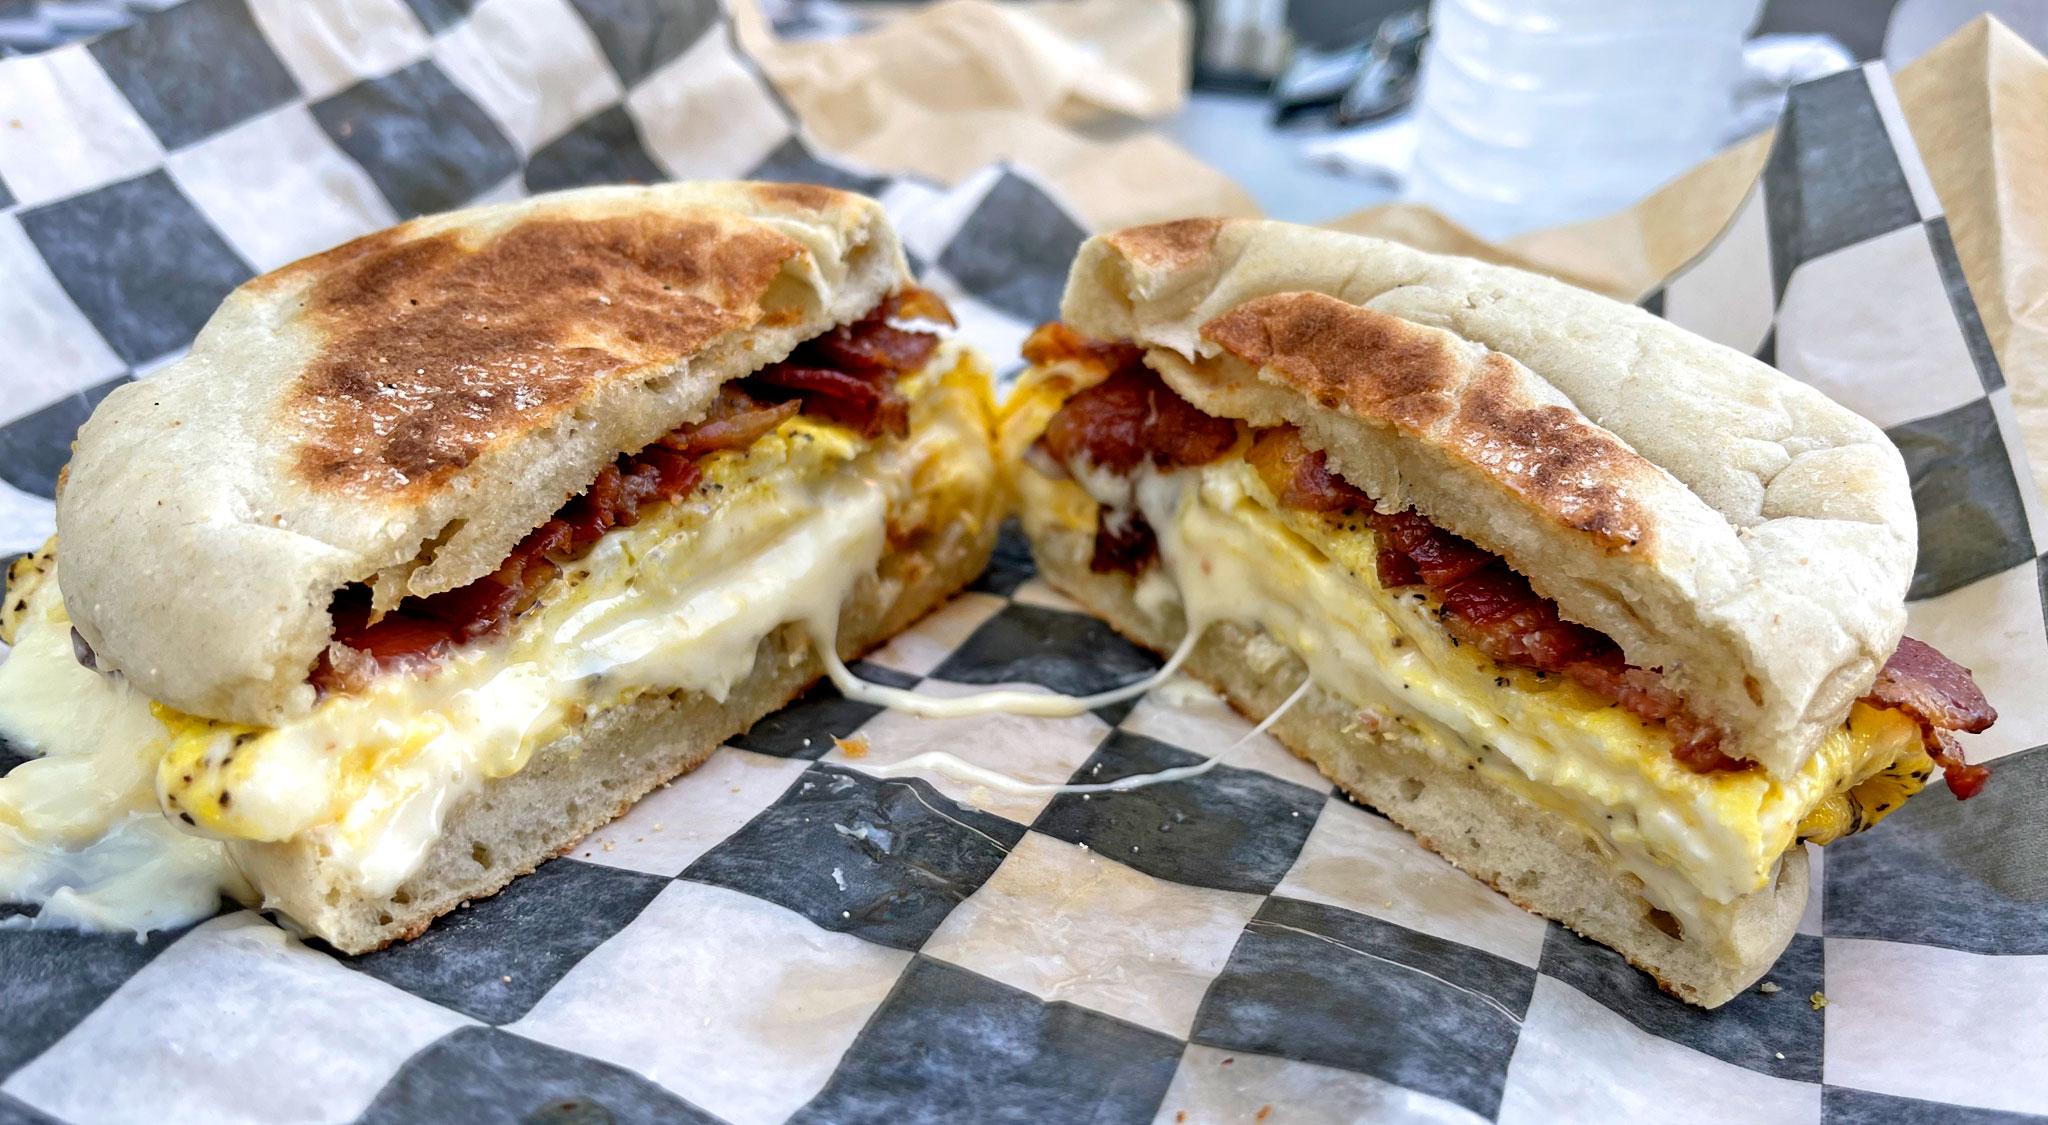 Bacon Egg & Cheese Breakfast Sandwich on English Muffin